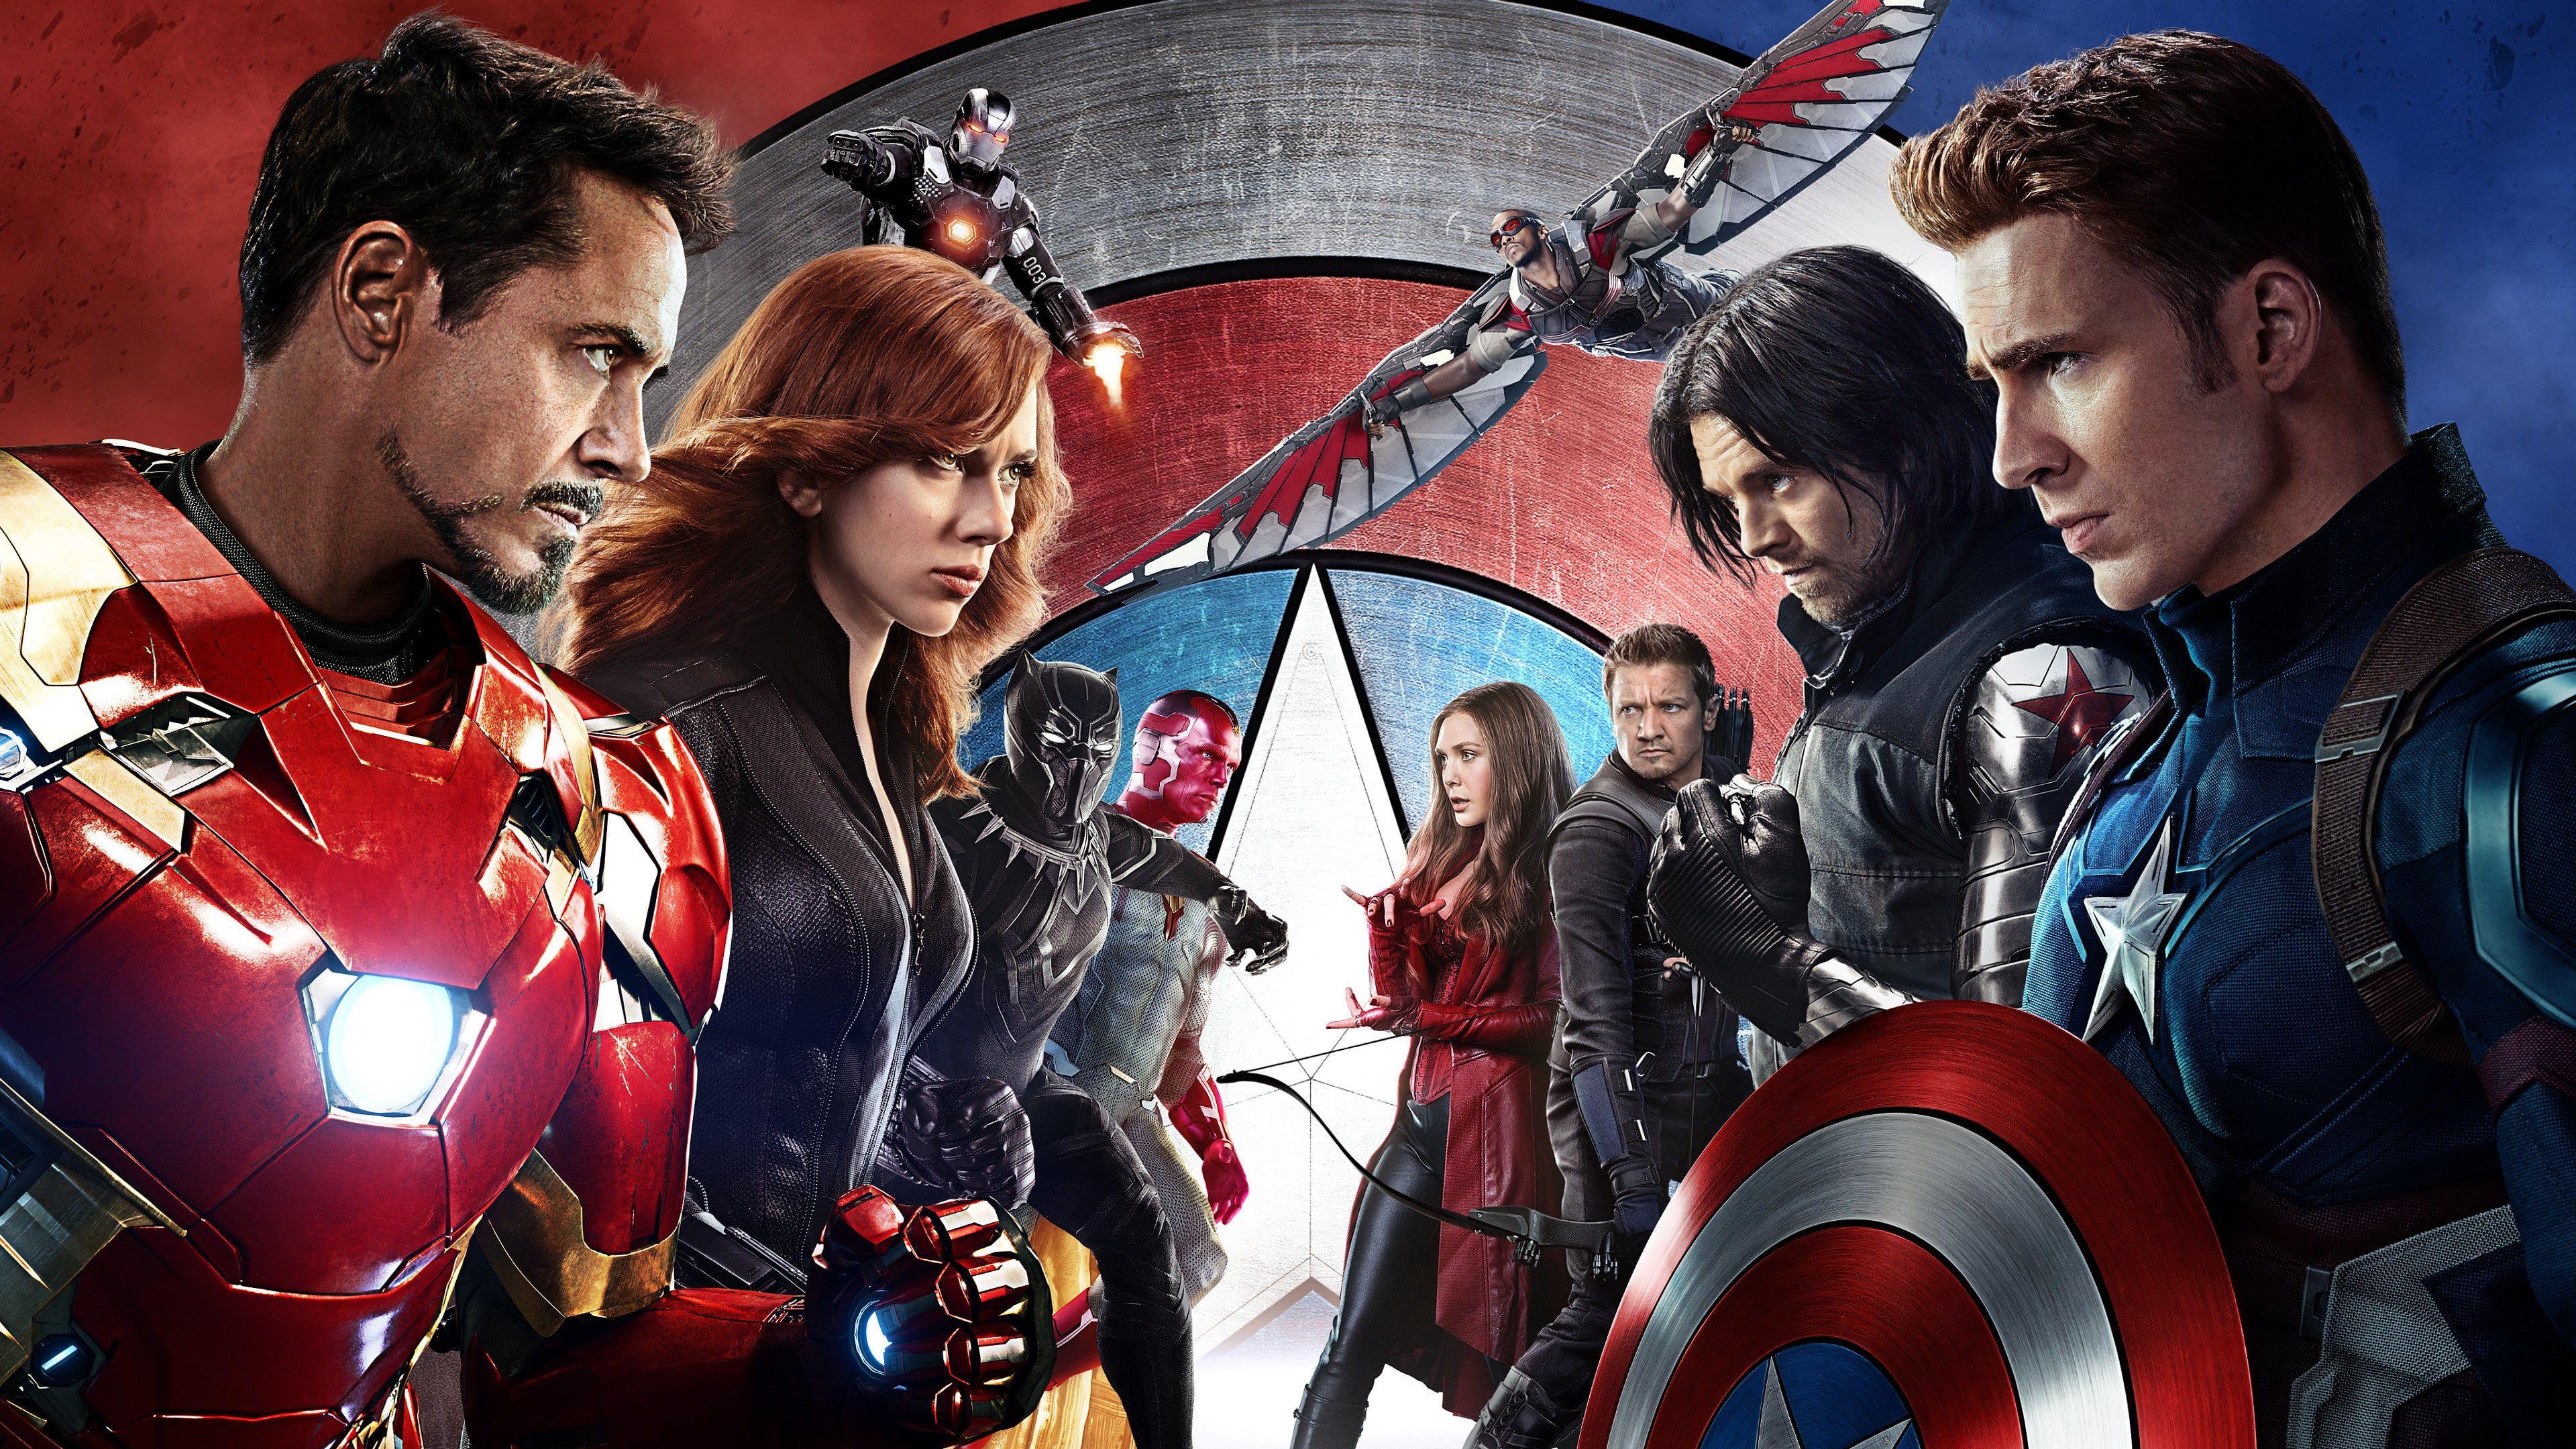 Amerika Kapitany Polgarhaboru 2016 Teljes Film Magyarul Online Hd Hu Mozi Amerika Kap Captain America Civil War Captain America Civil America Civil War